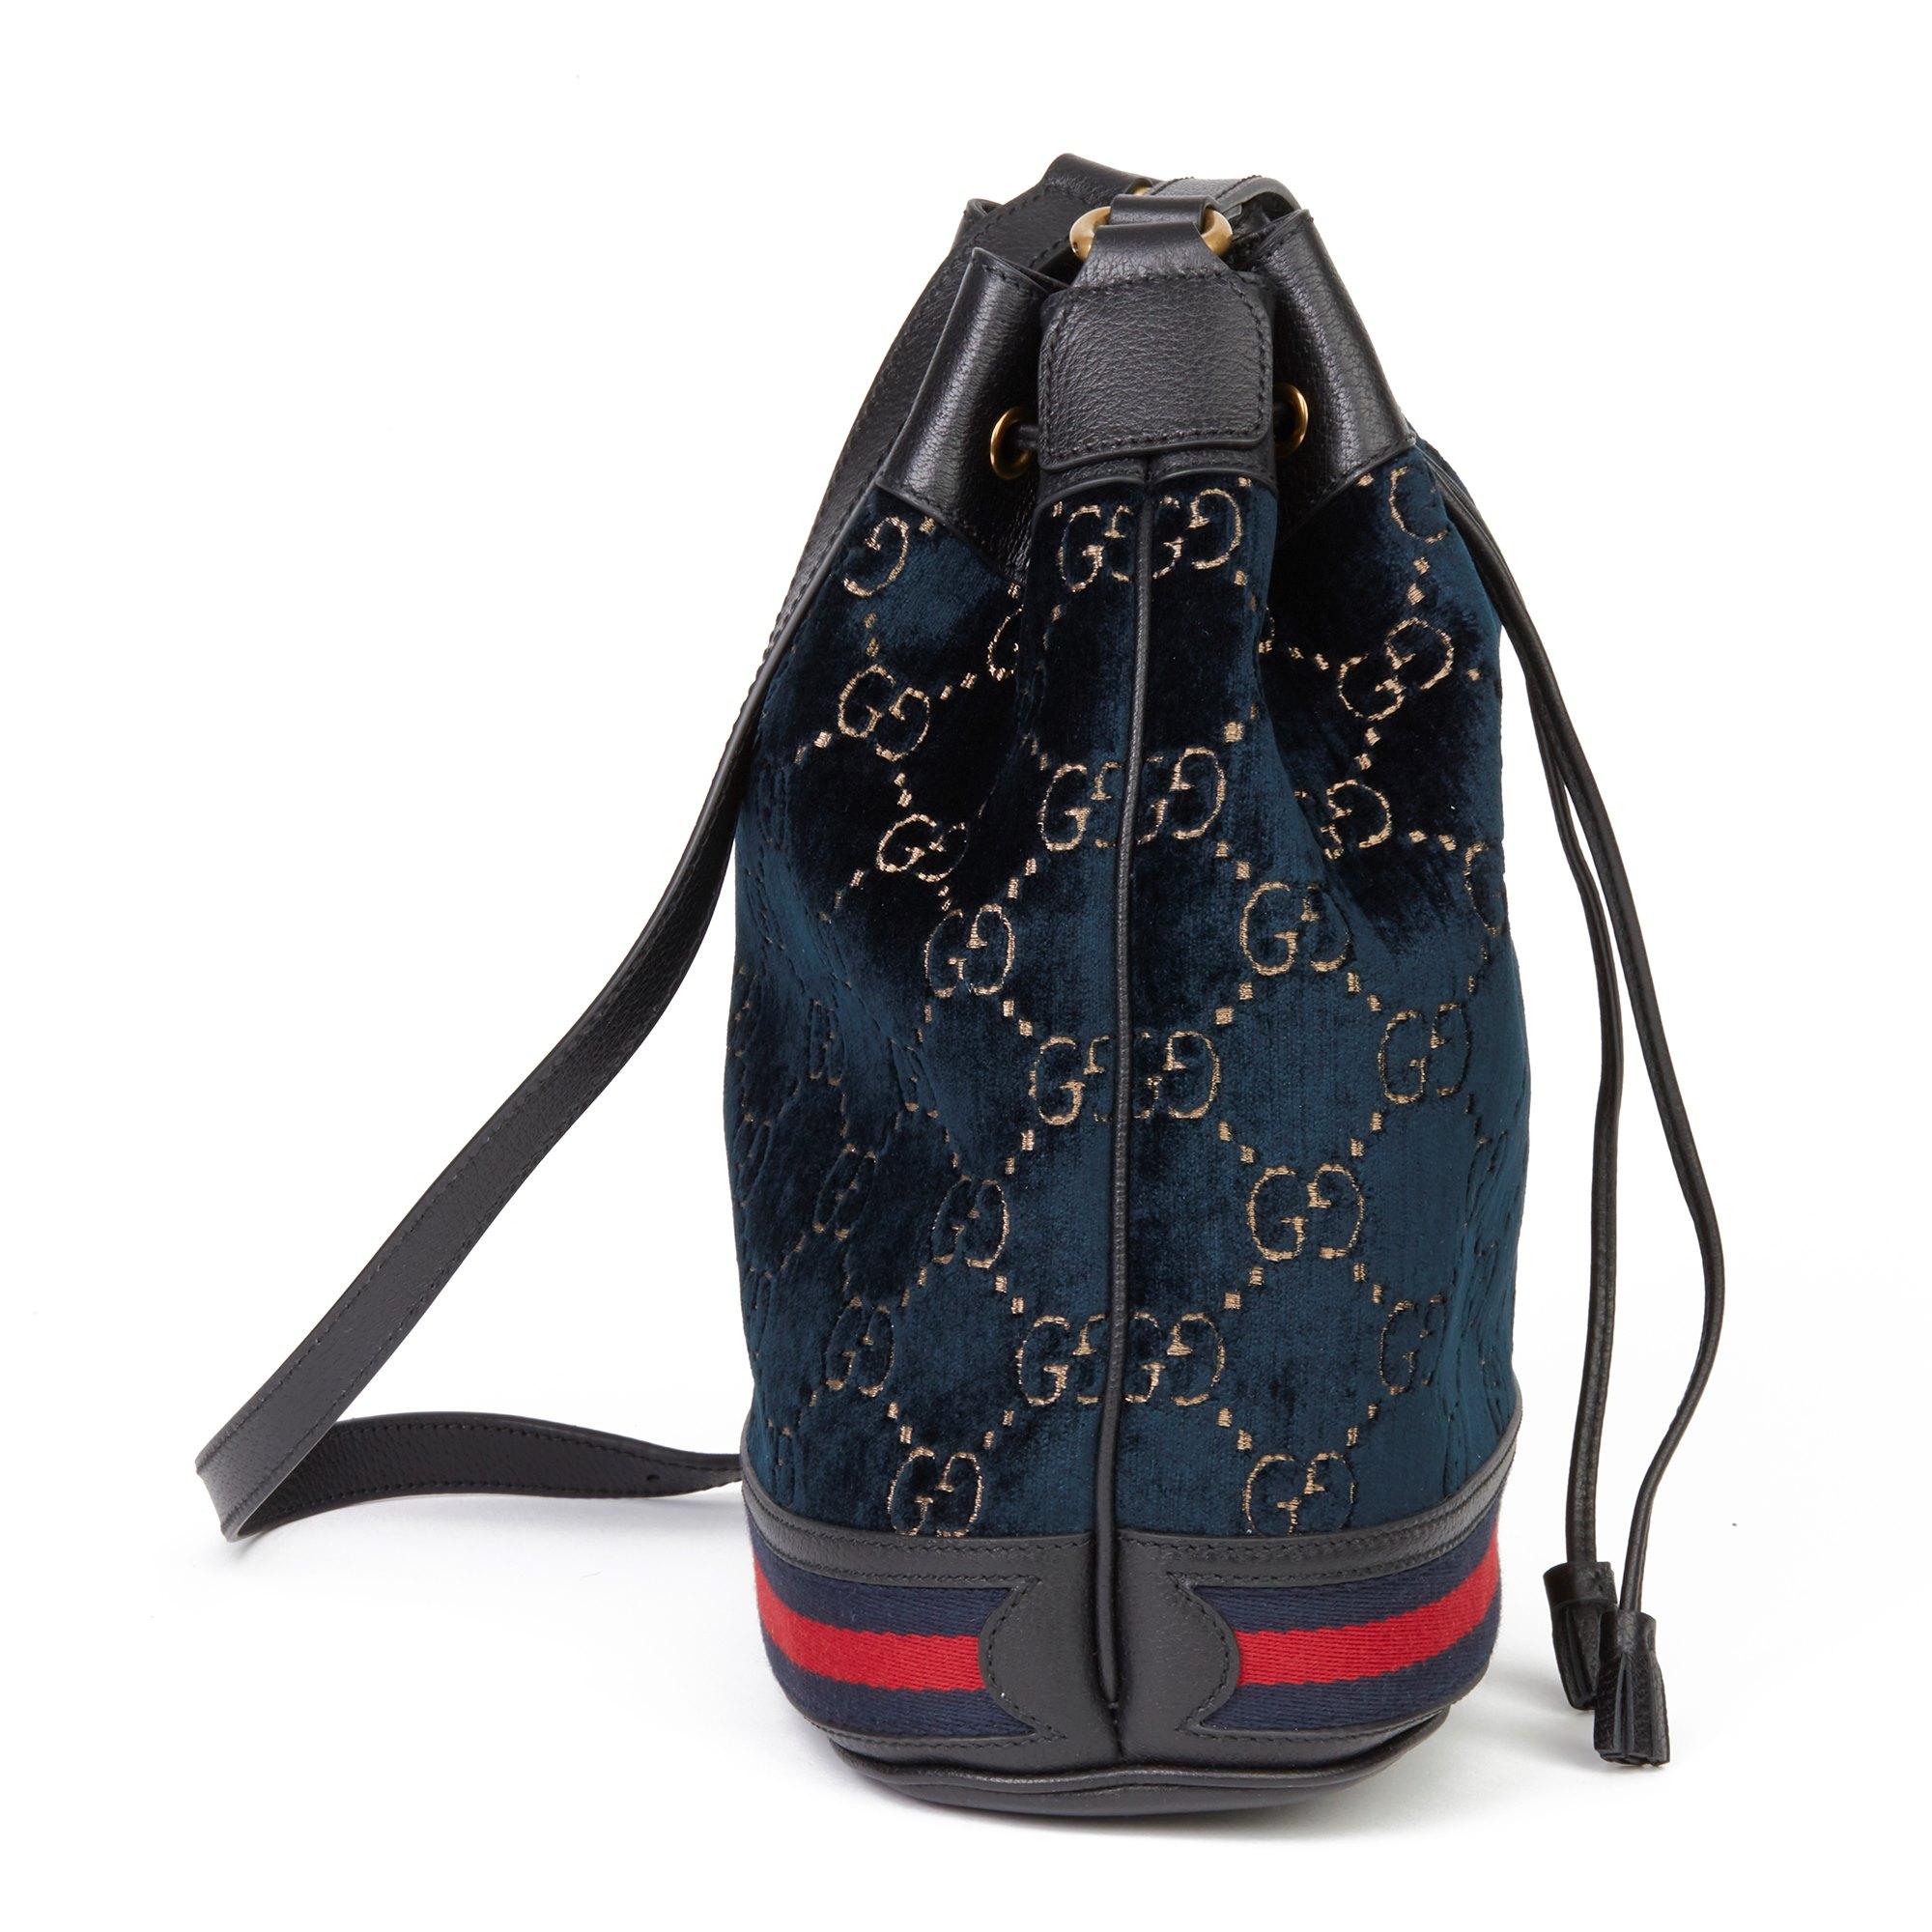 Gucci Dark Blue GG Velvet & Black Pigskin Leather Web Bucket Bag